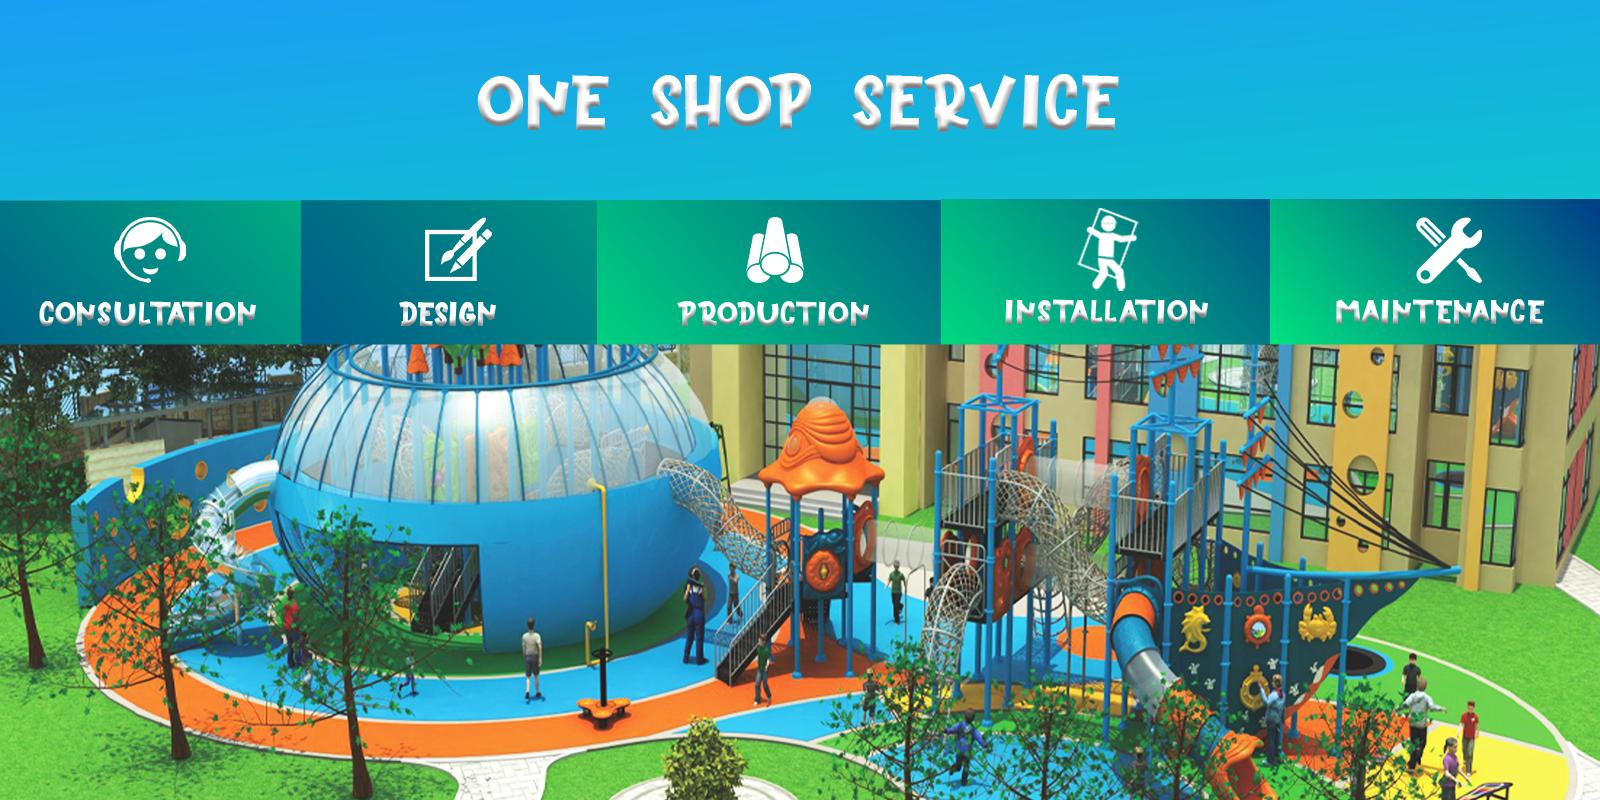 One Shop Service